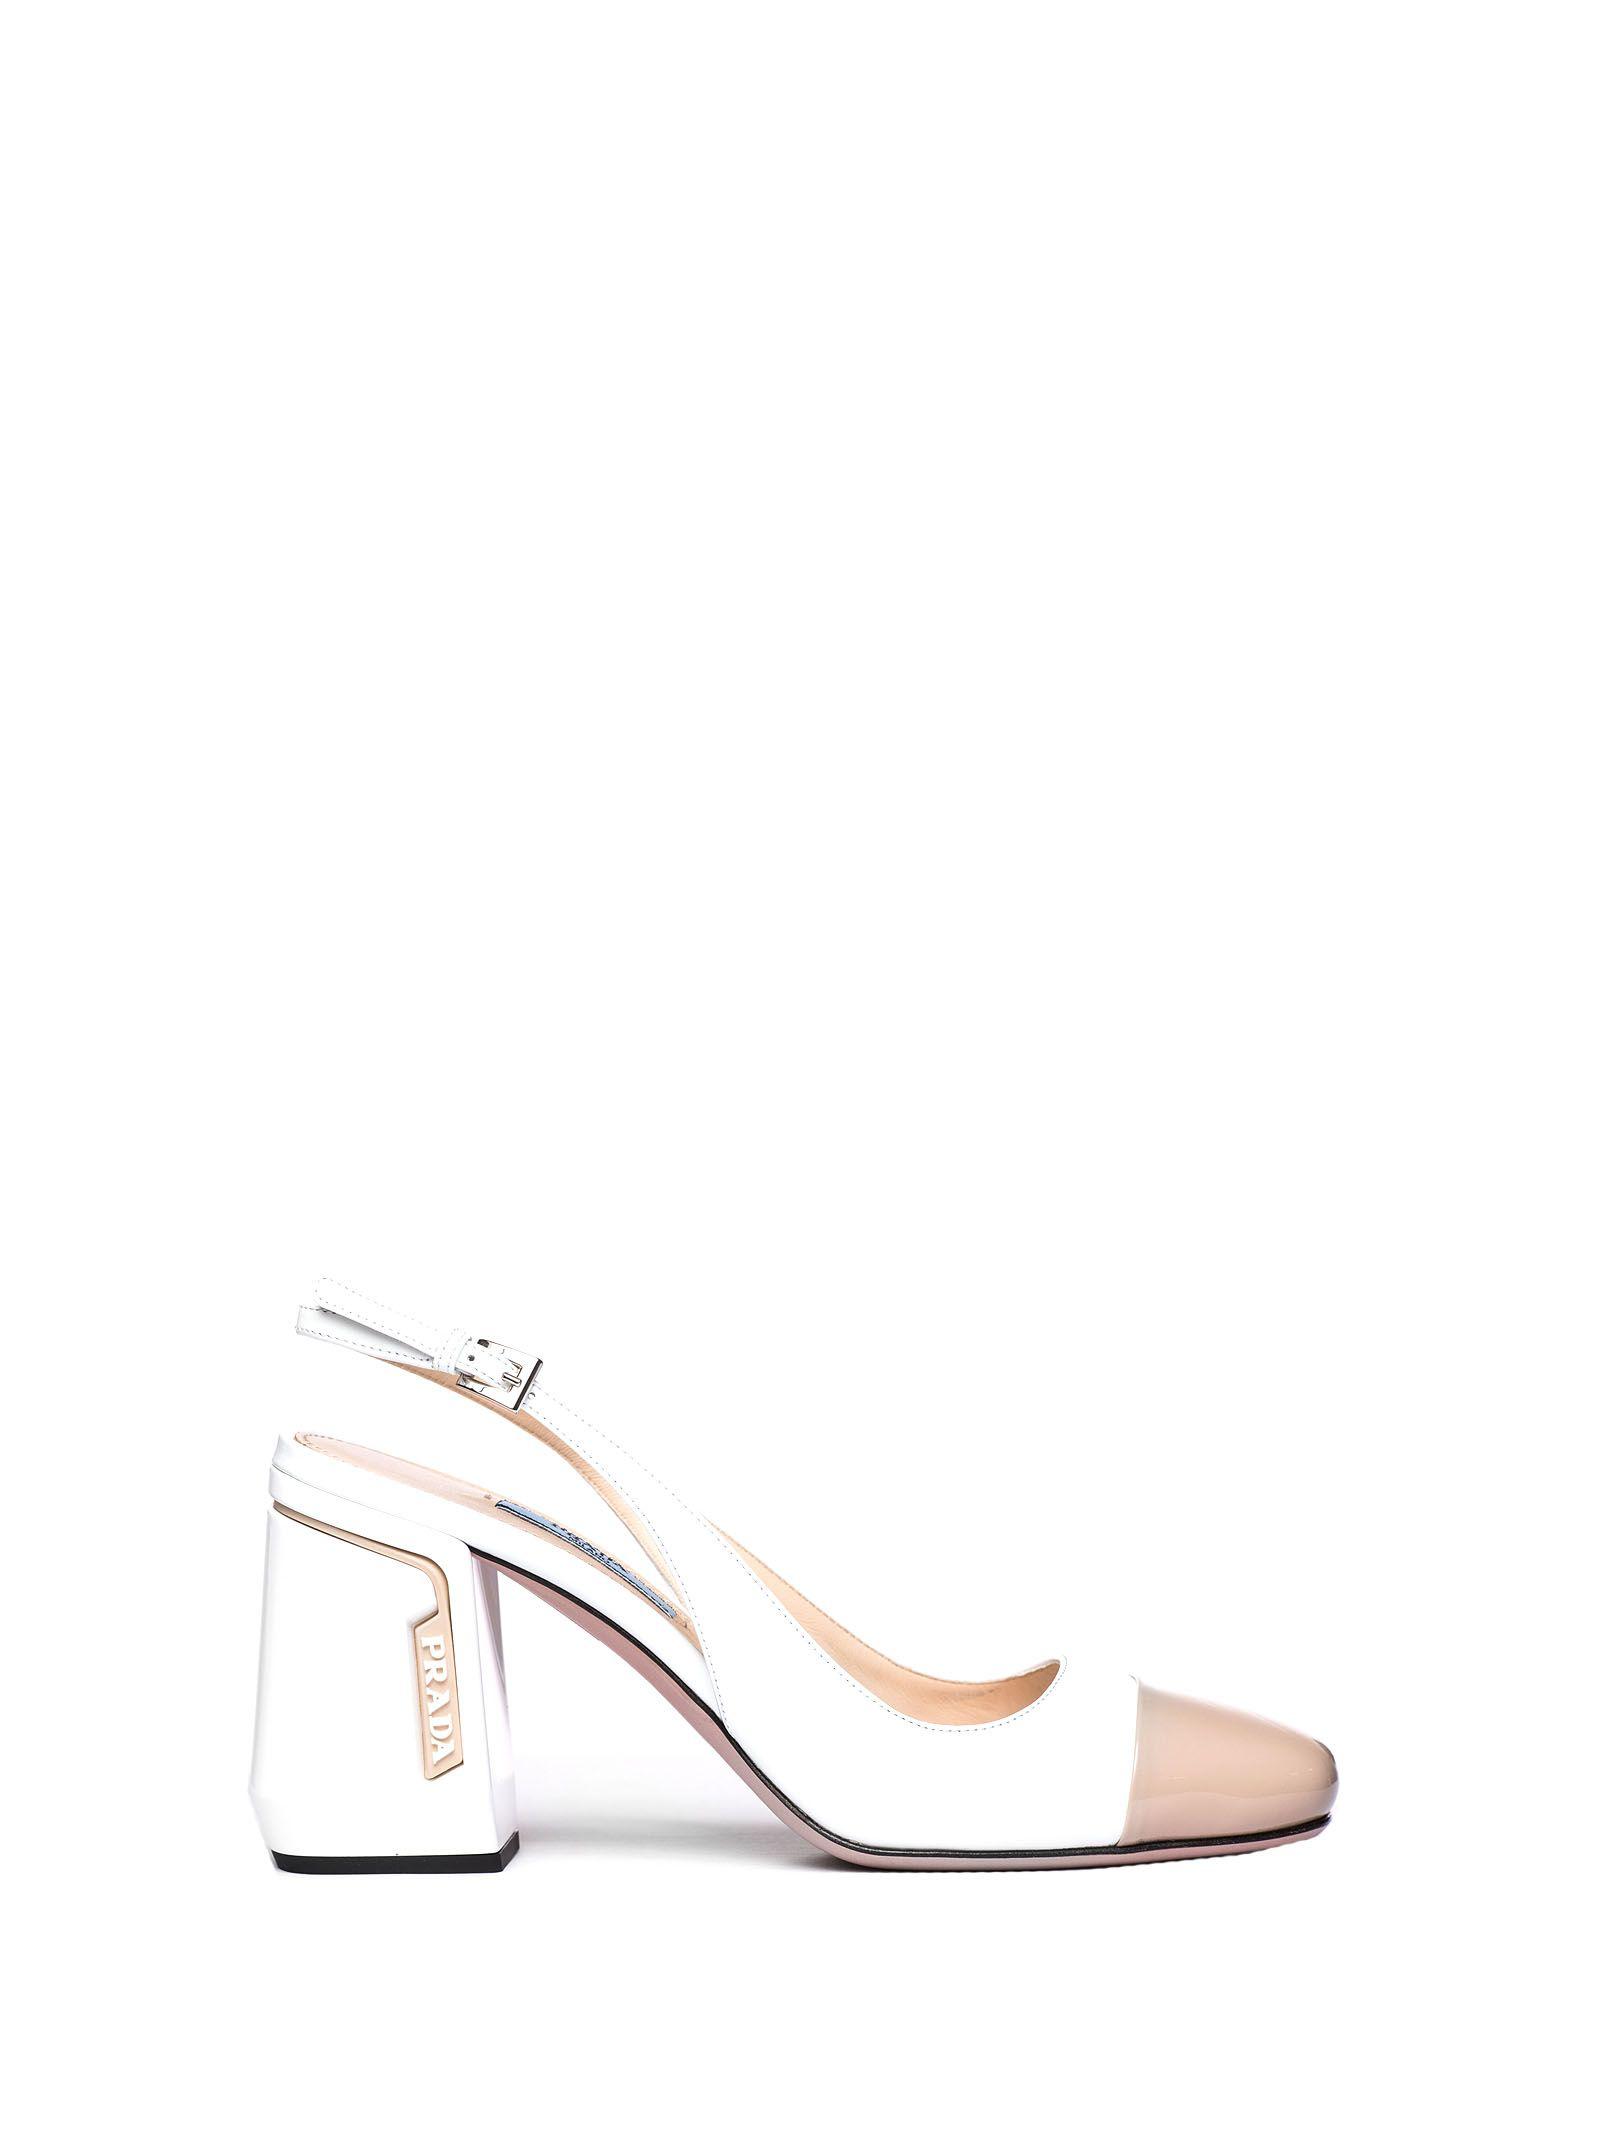 0ebb4106ee Prada White Patent Slingbacks In Bianco+Travertino | ModeSens